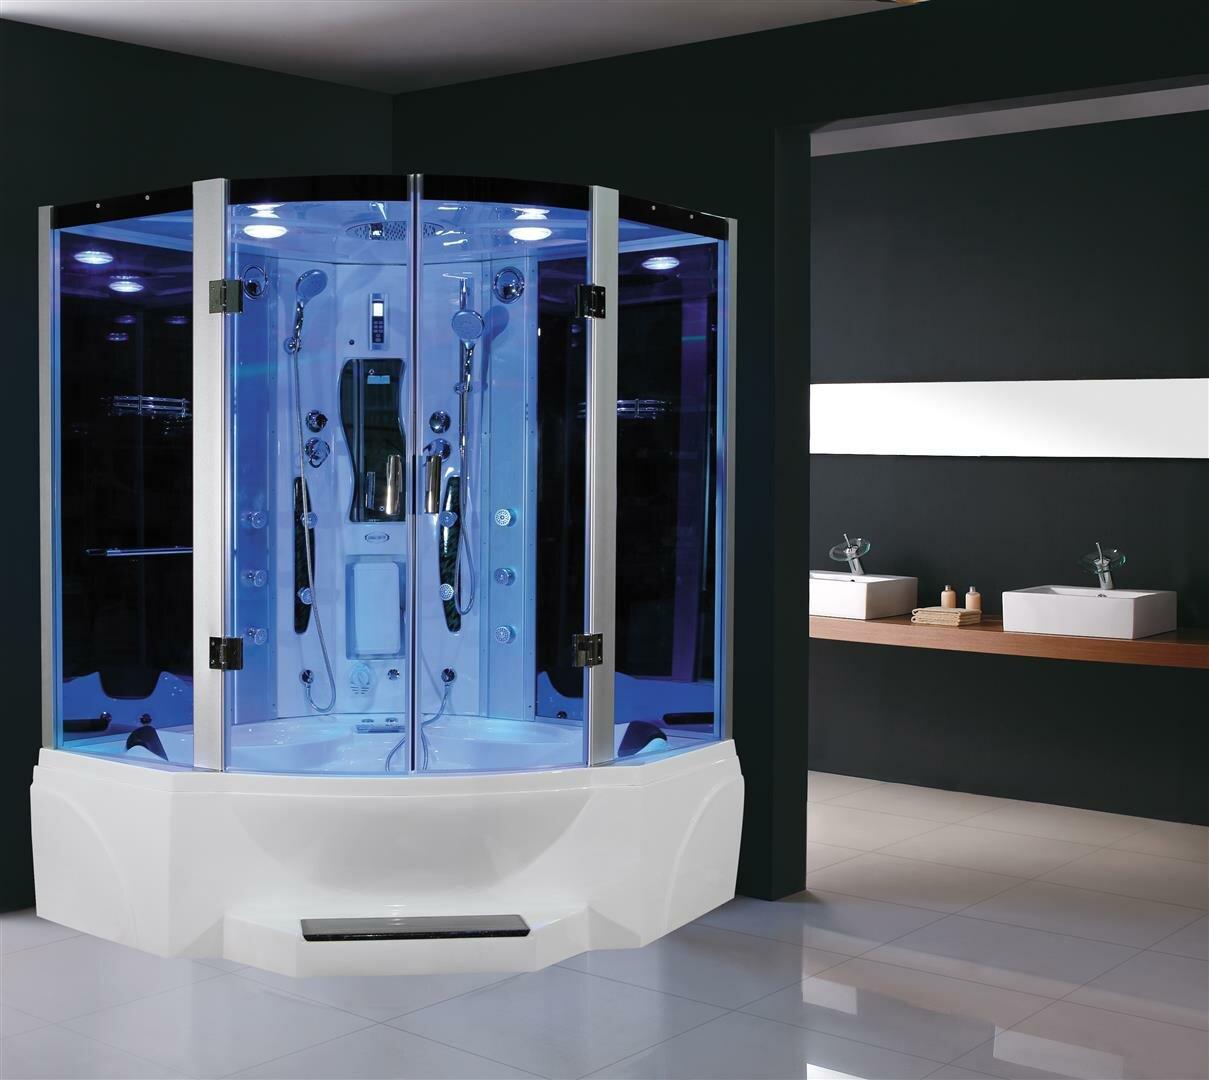 Old Fashioned Framed Shower Screen Festooning - Bathtub Design Ideas ...